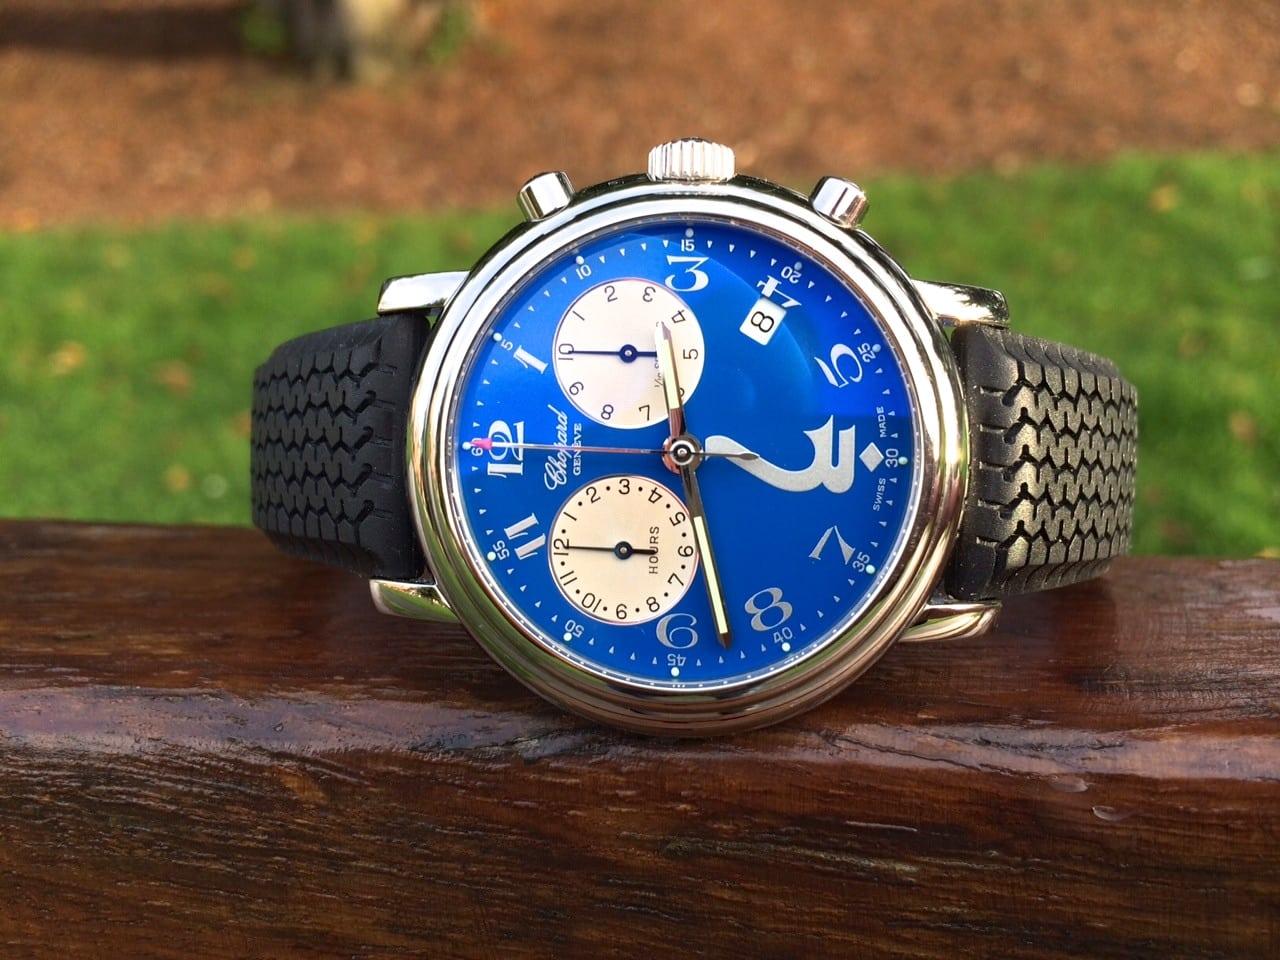 Chopard Godolphin chrono 1/10th second timer-limited edition